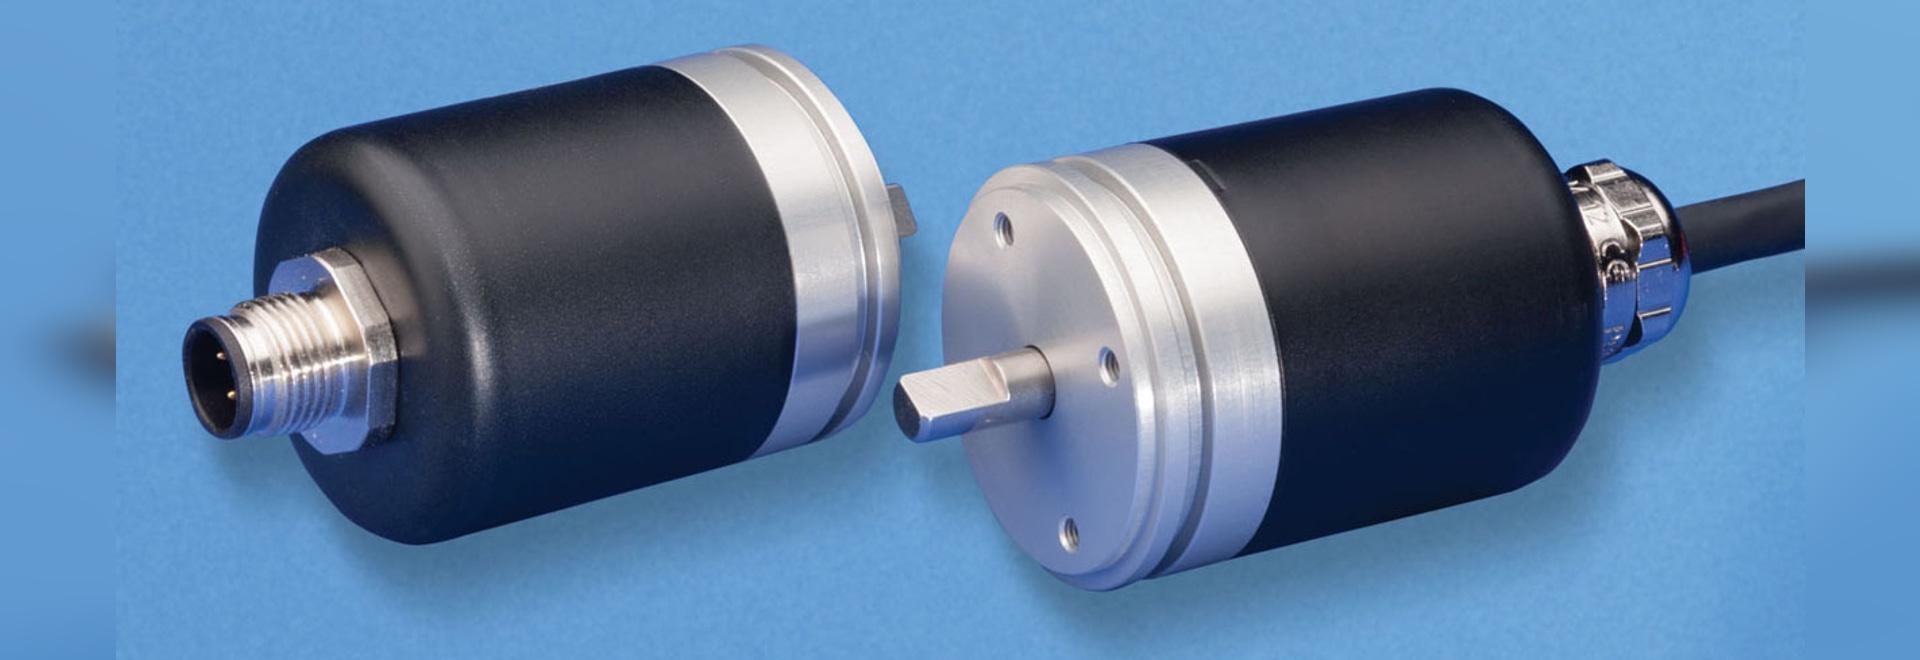 Novotechnik introduces RSB 3600 Series of absolute single-turn angle sensors